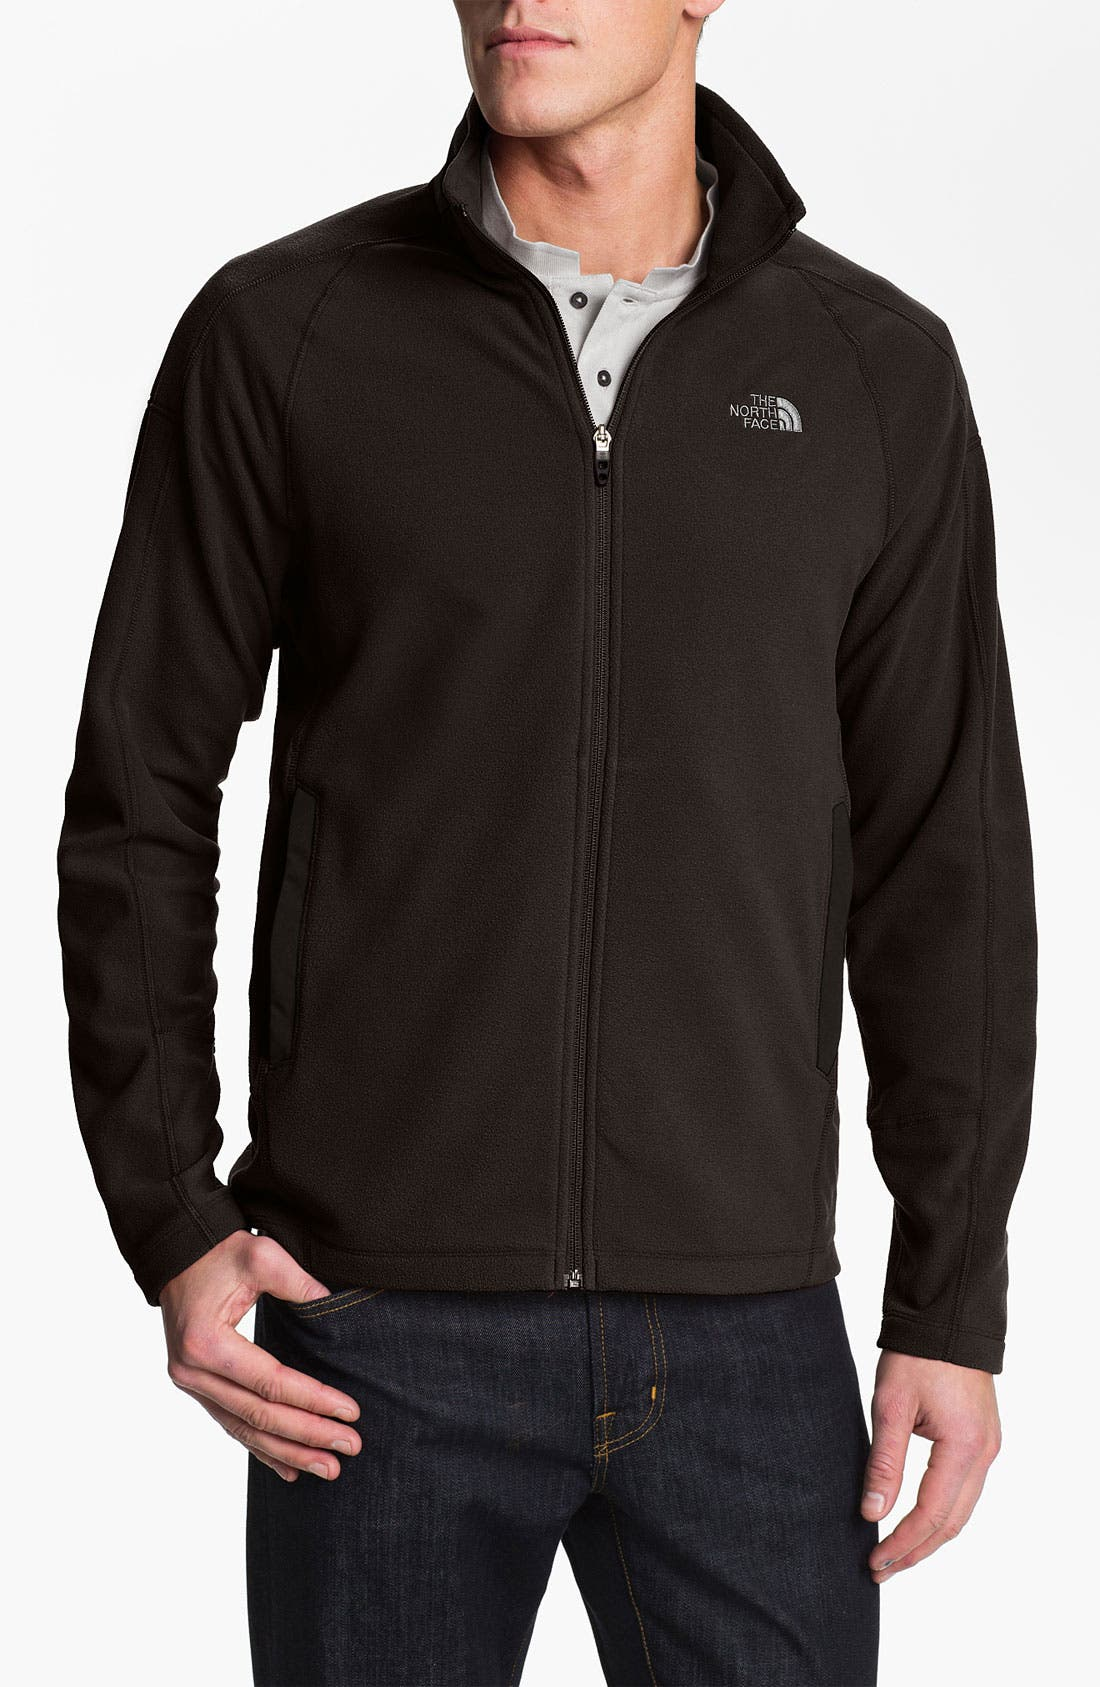 Main Image - The North Face 'RDT 100' FlashDry™ Full Zip Fleece Jacket